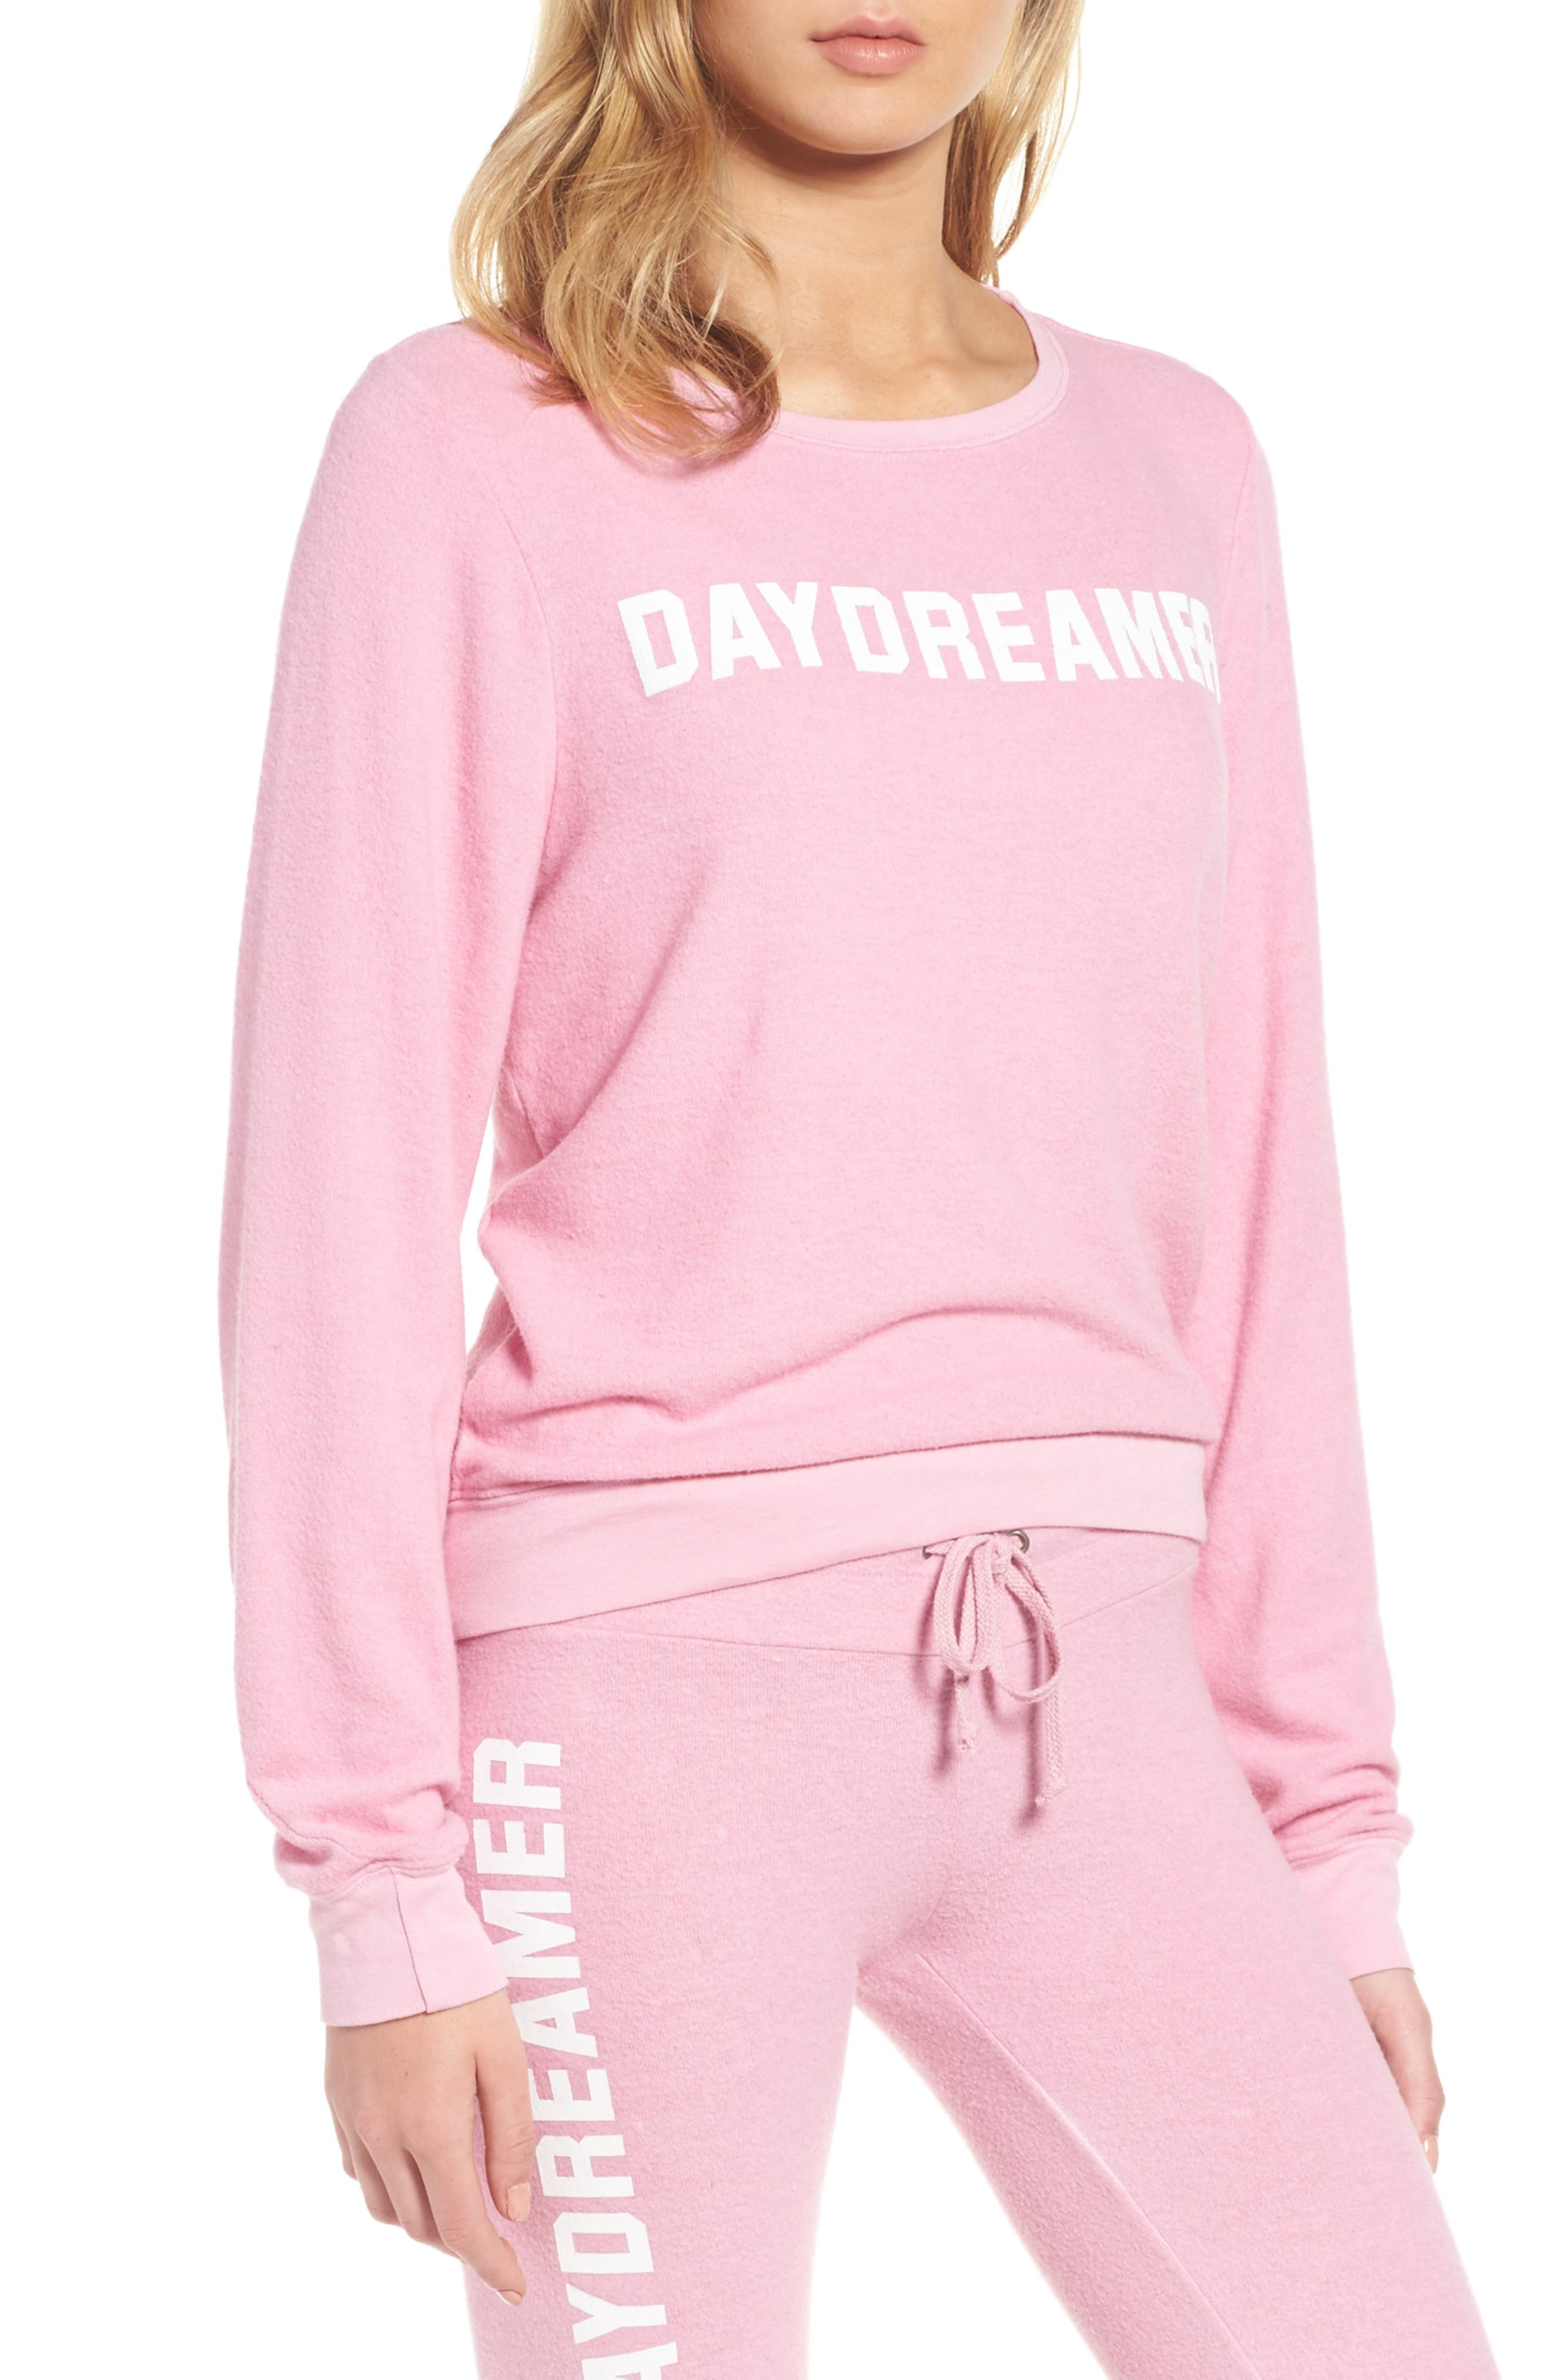 Daydreamer Sweatshirt,                         Main,                         color, Pink